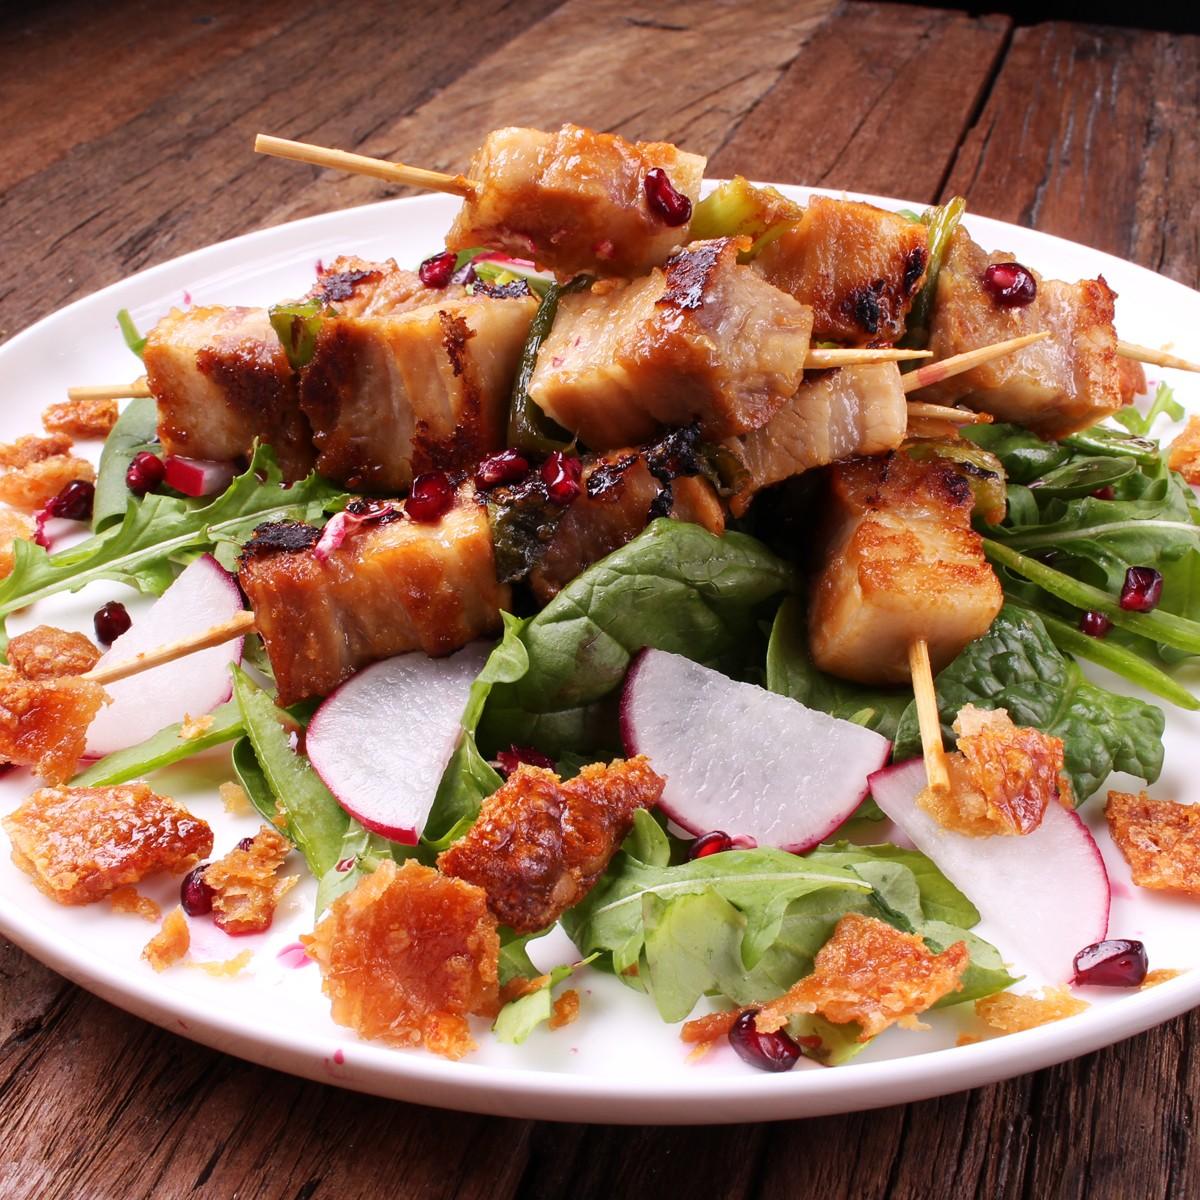 Boozy Miso Pork Belly Skewers - Three Aussie Farmers Slow Cooked Pork Belly